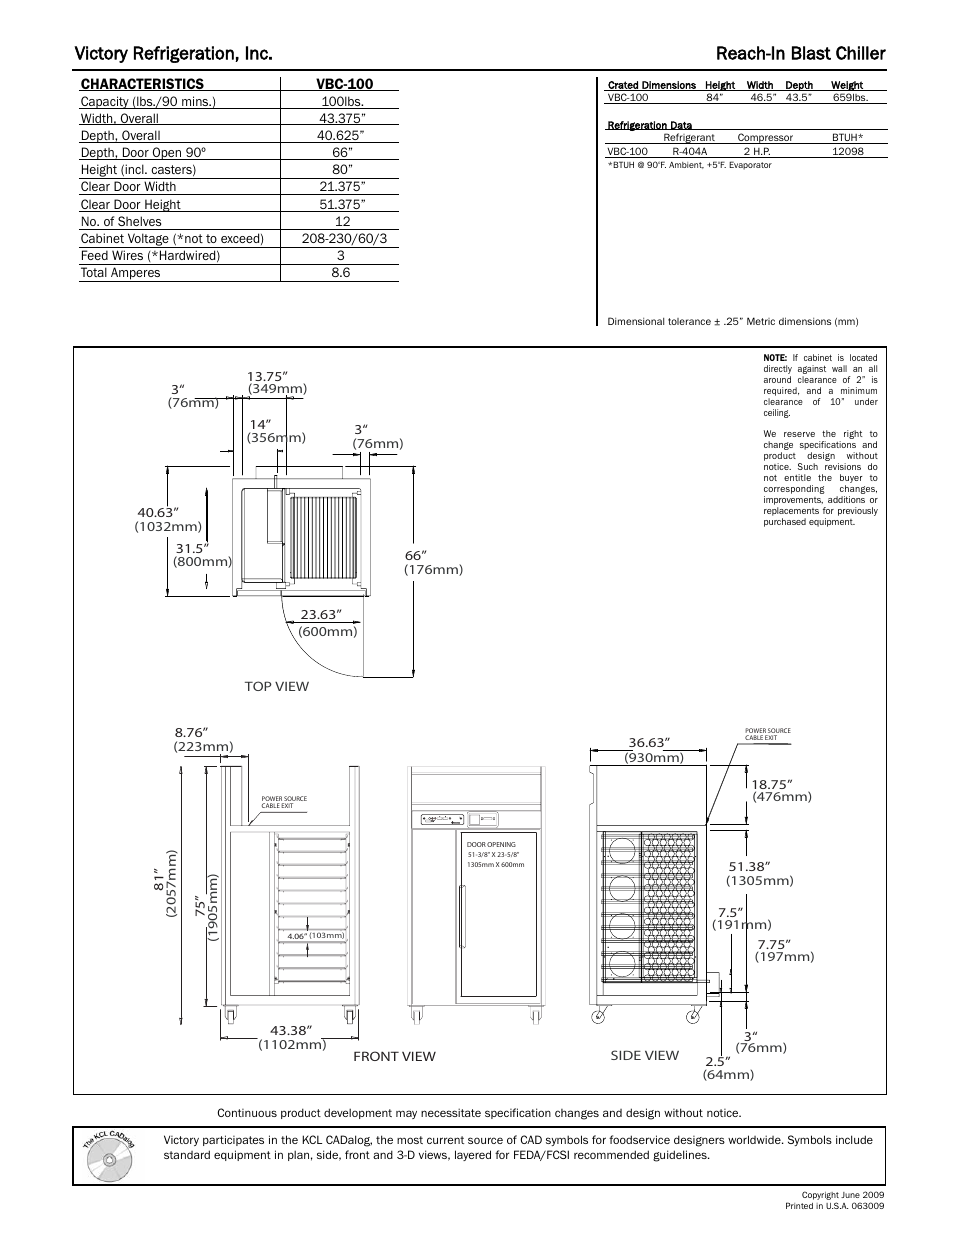 Victory refrigeration, inc. reach-in blast chiller | Victory Refrigeration  VBC-100 User Manual | Page 2 / 2